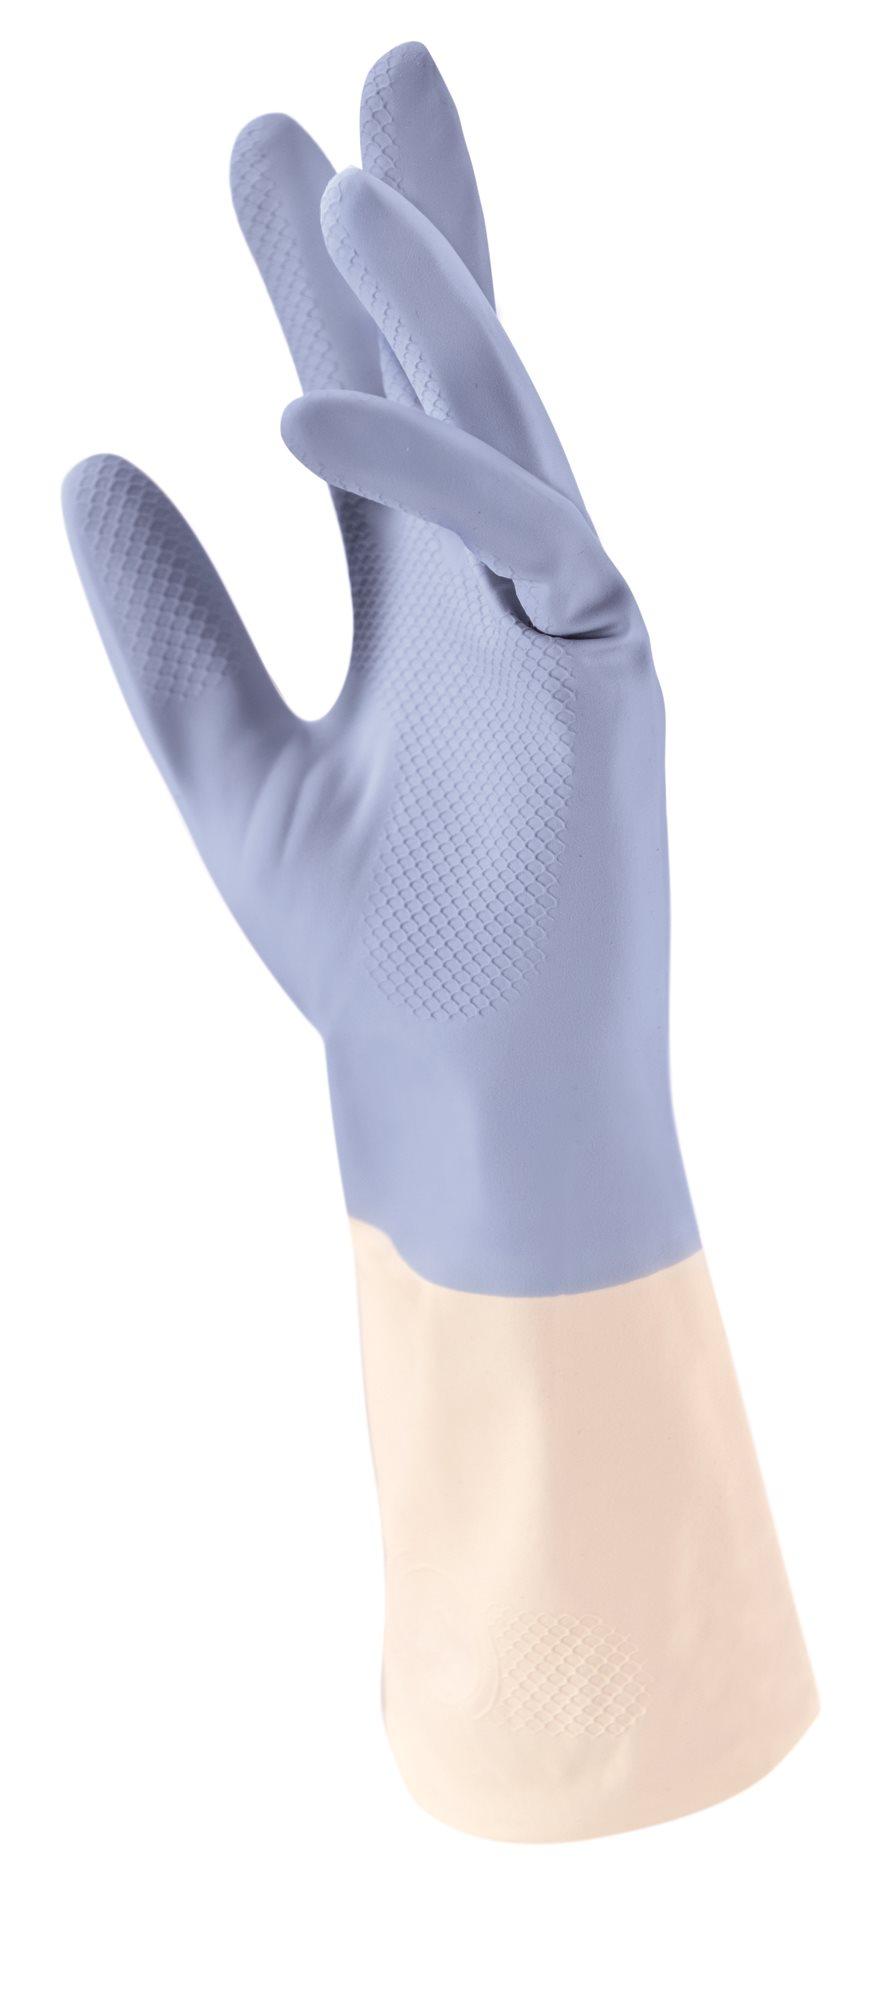 Tescoma Γάντια Lattex με Βαμβακερή Επίστρωση & Αλόη Profimate Medium